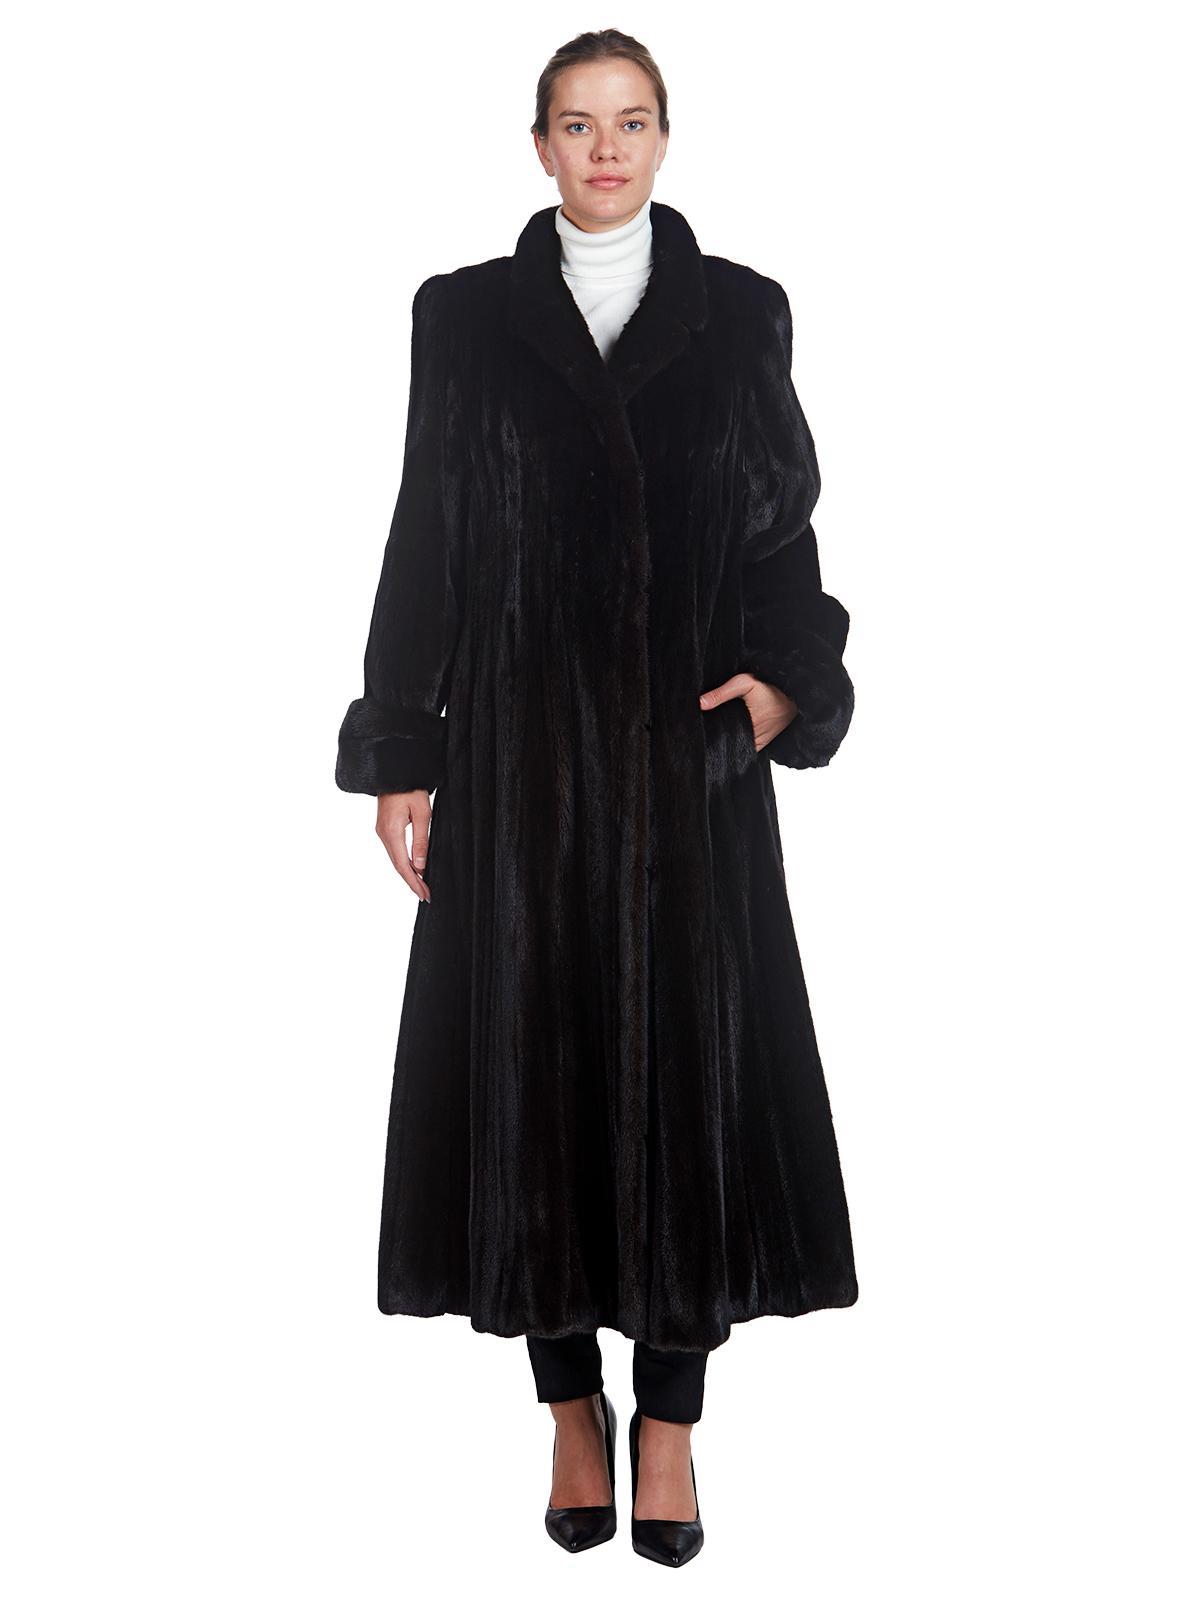 Woman's Full Length Neiman Marcus Ranch Mink Fur Coat